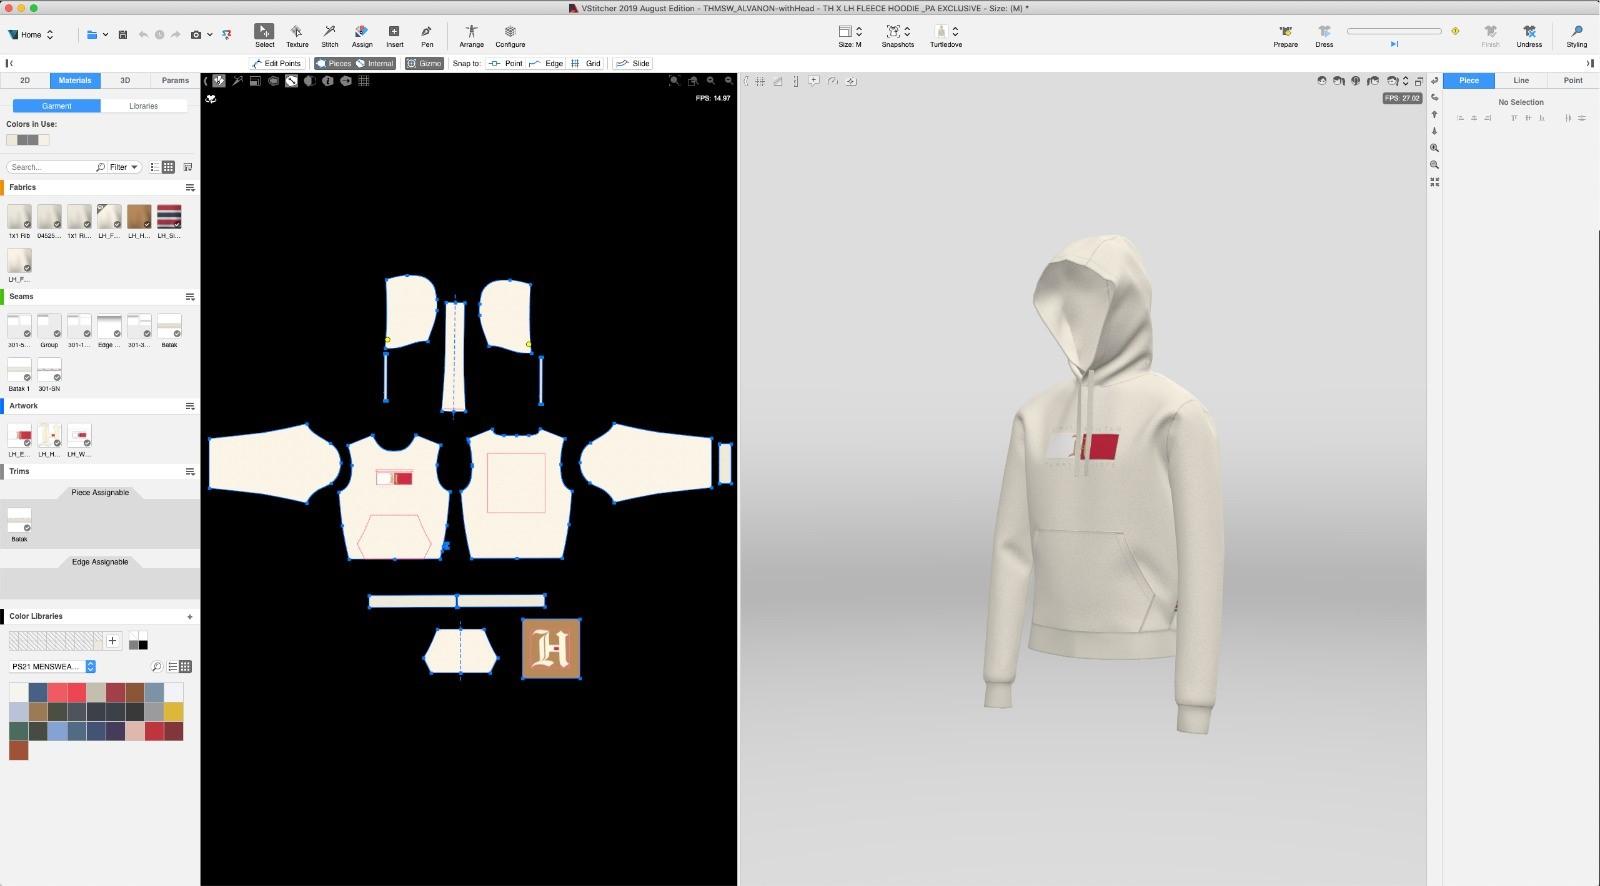 Tommy Hilfiger implements 3D design technology